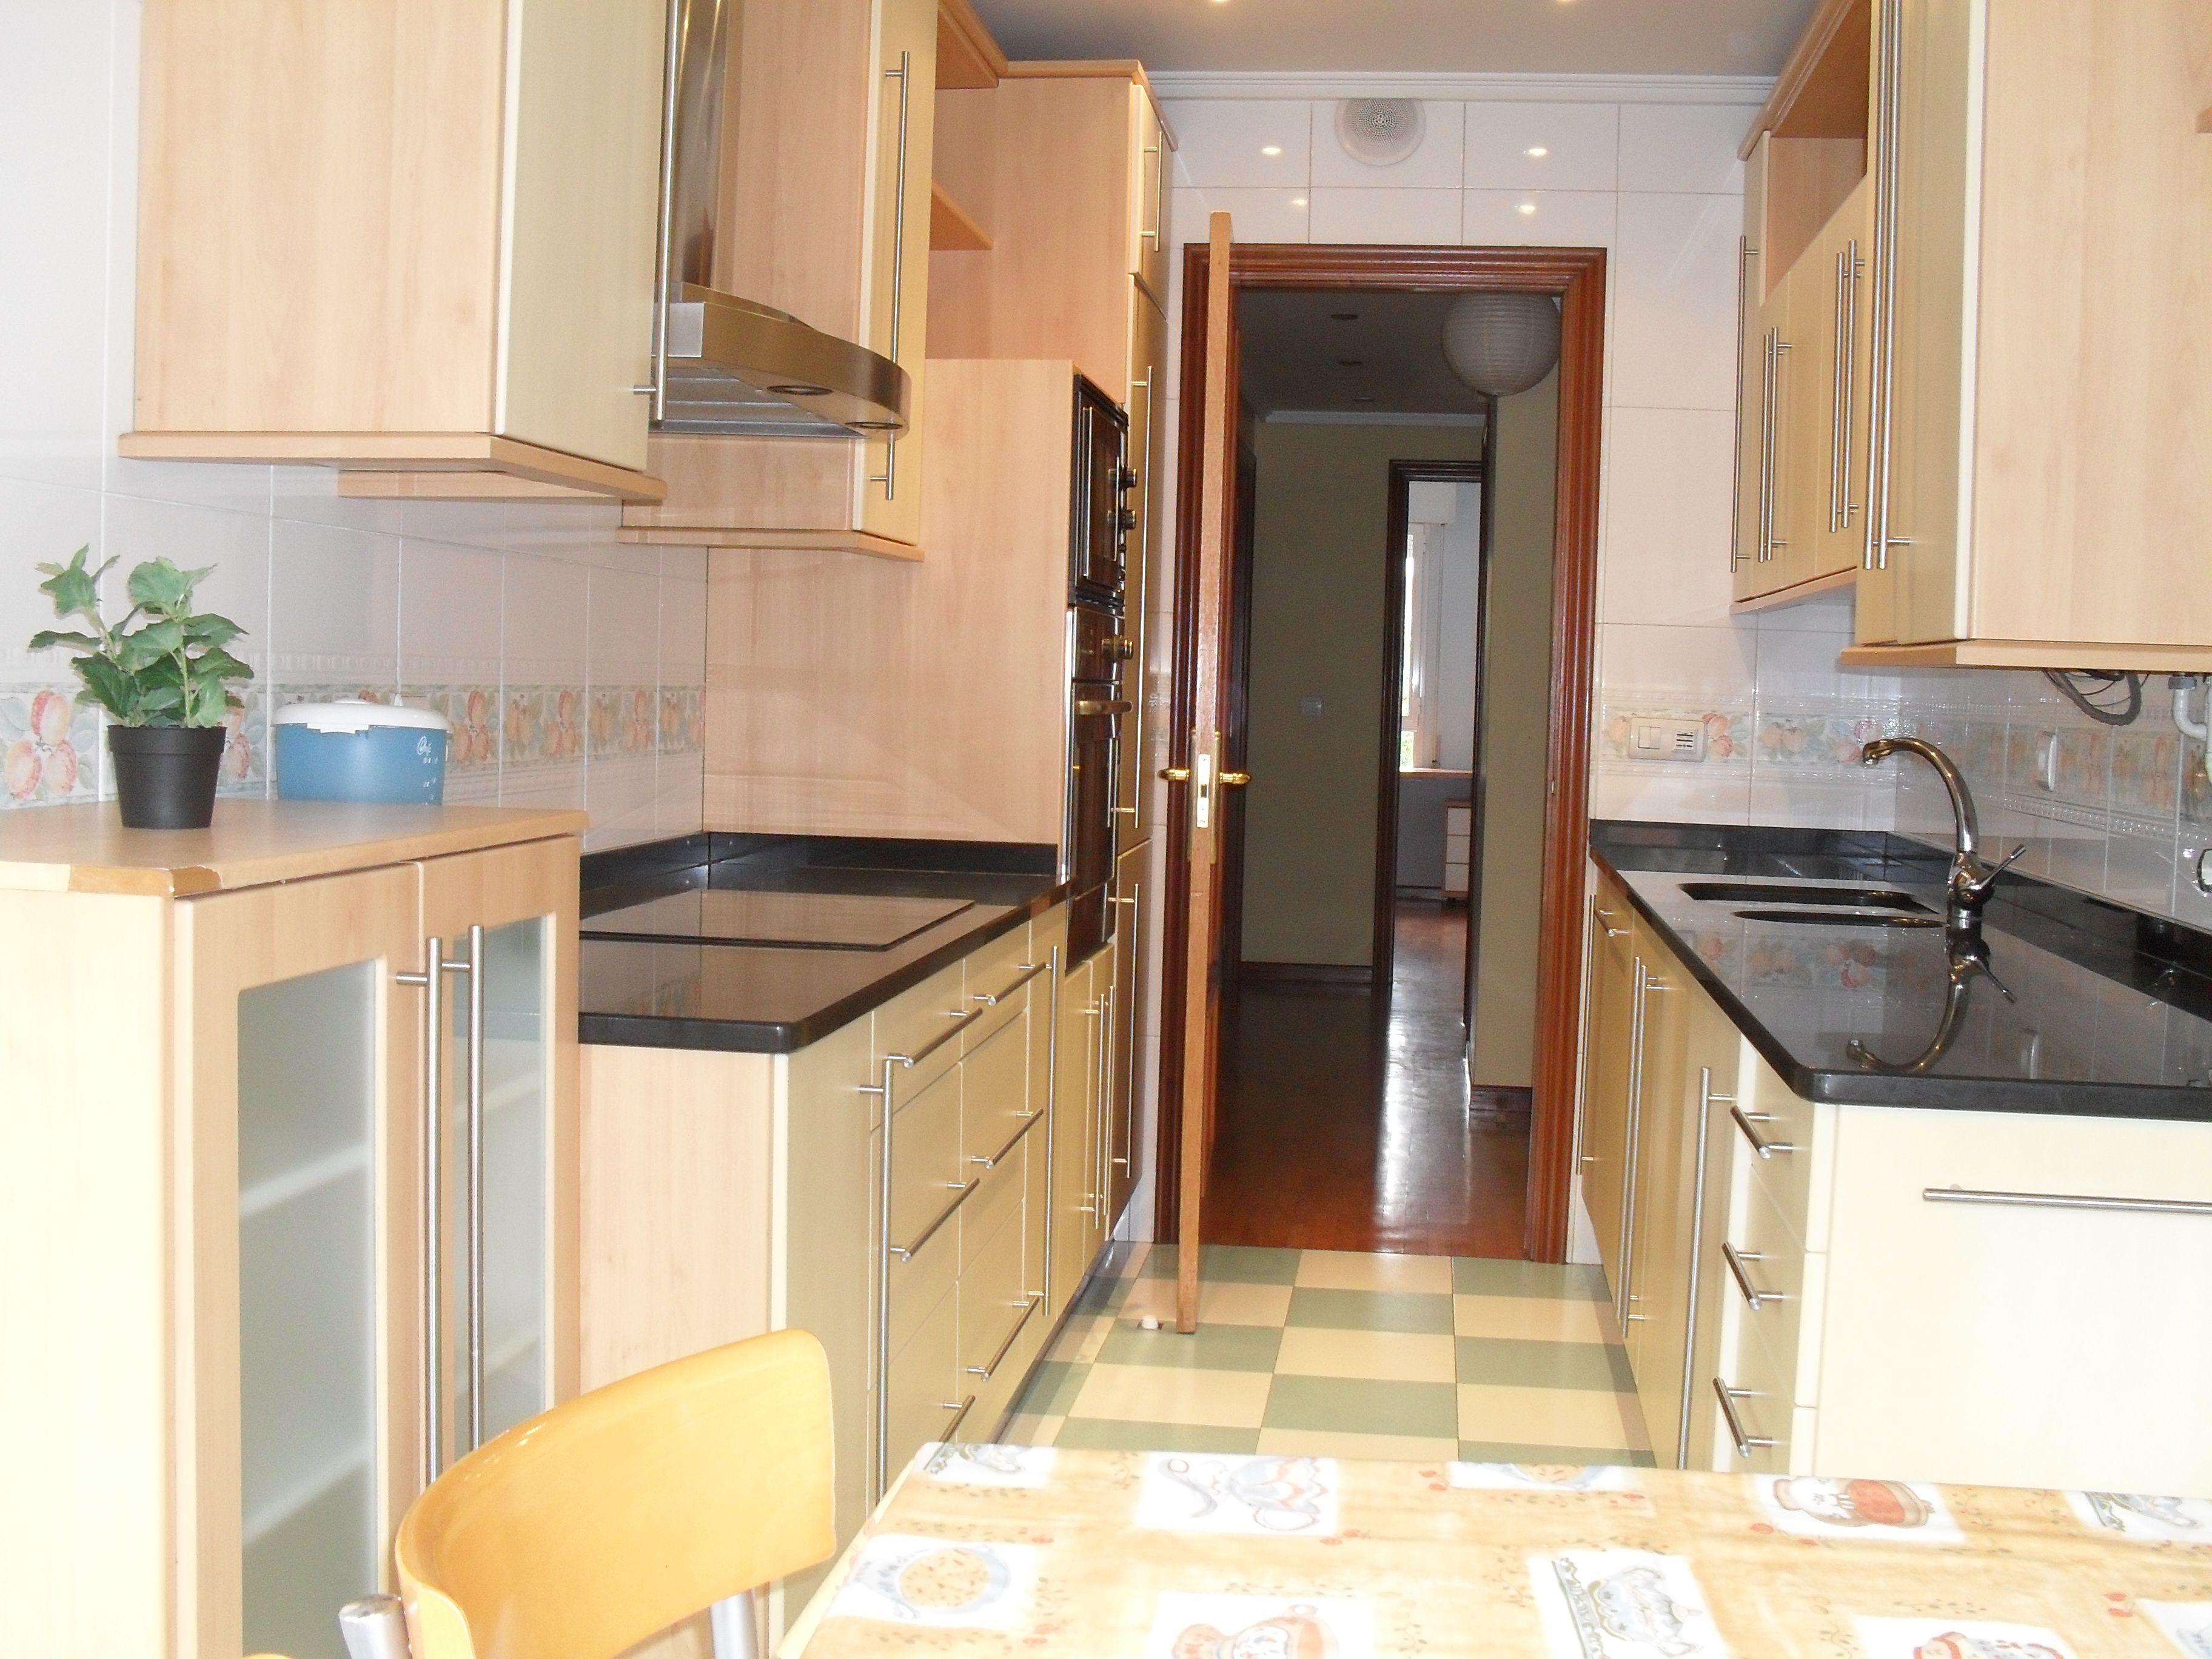 Apartamento céntrico en Vitoria de 3 dormitorios